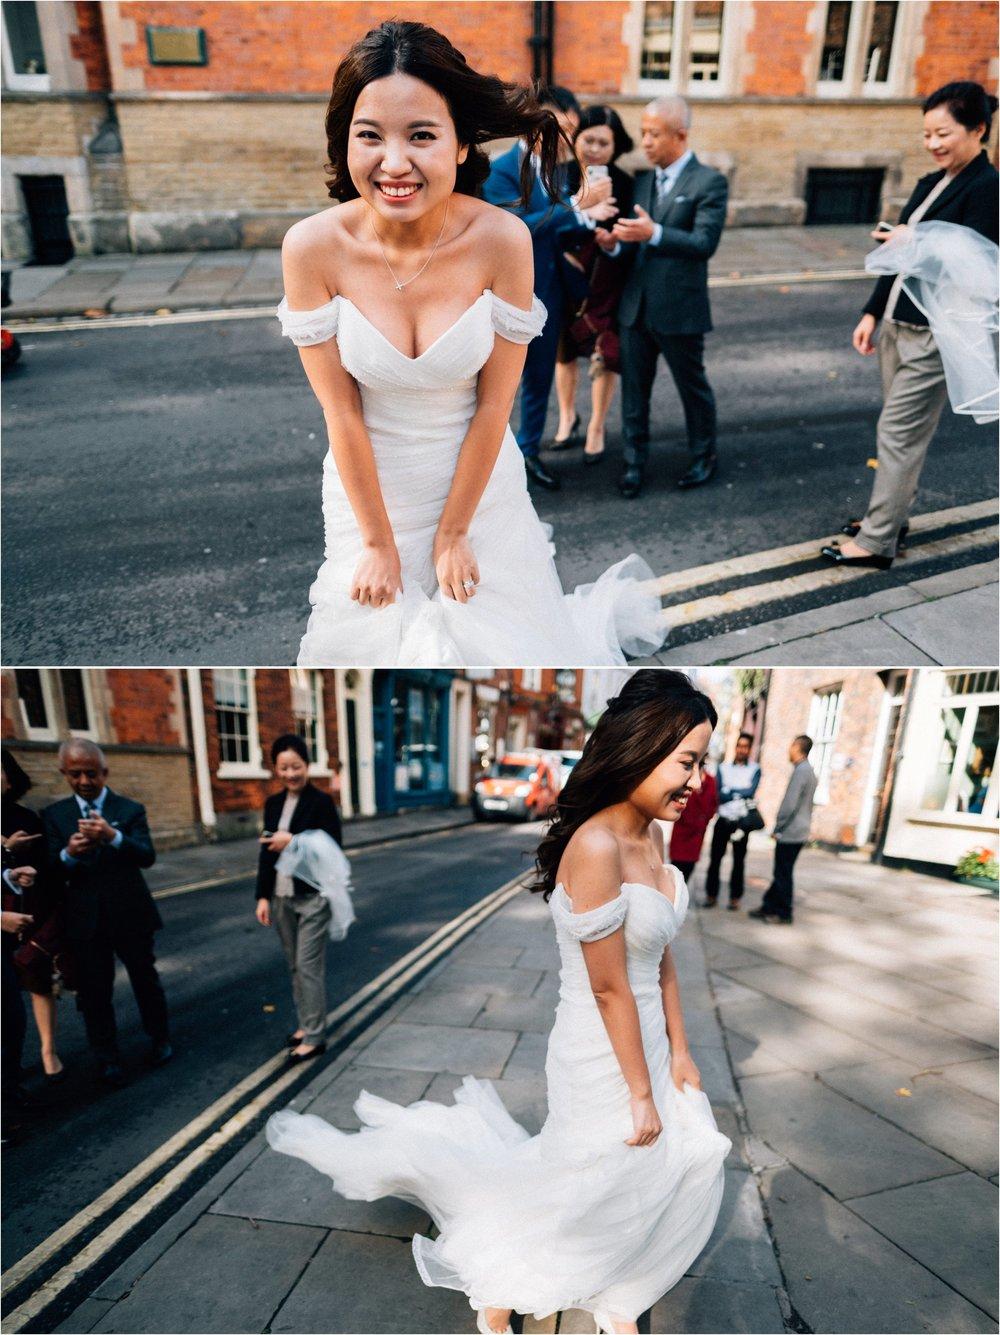 York city elopement wedding photographer_0072.jpg